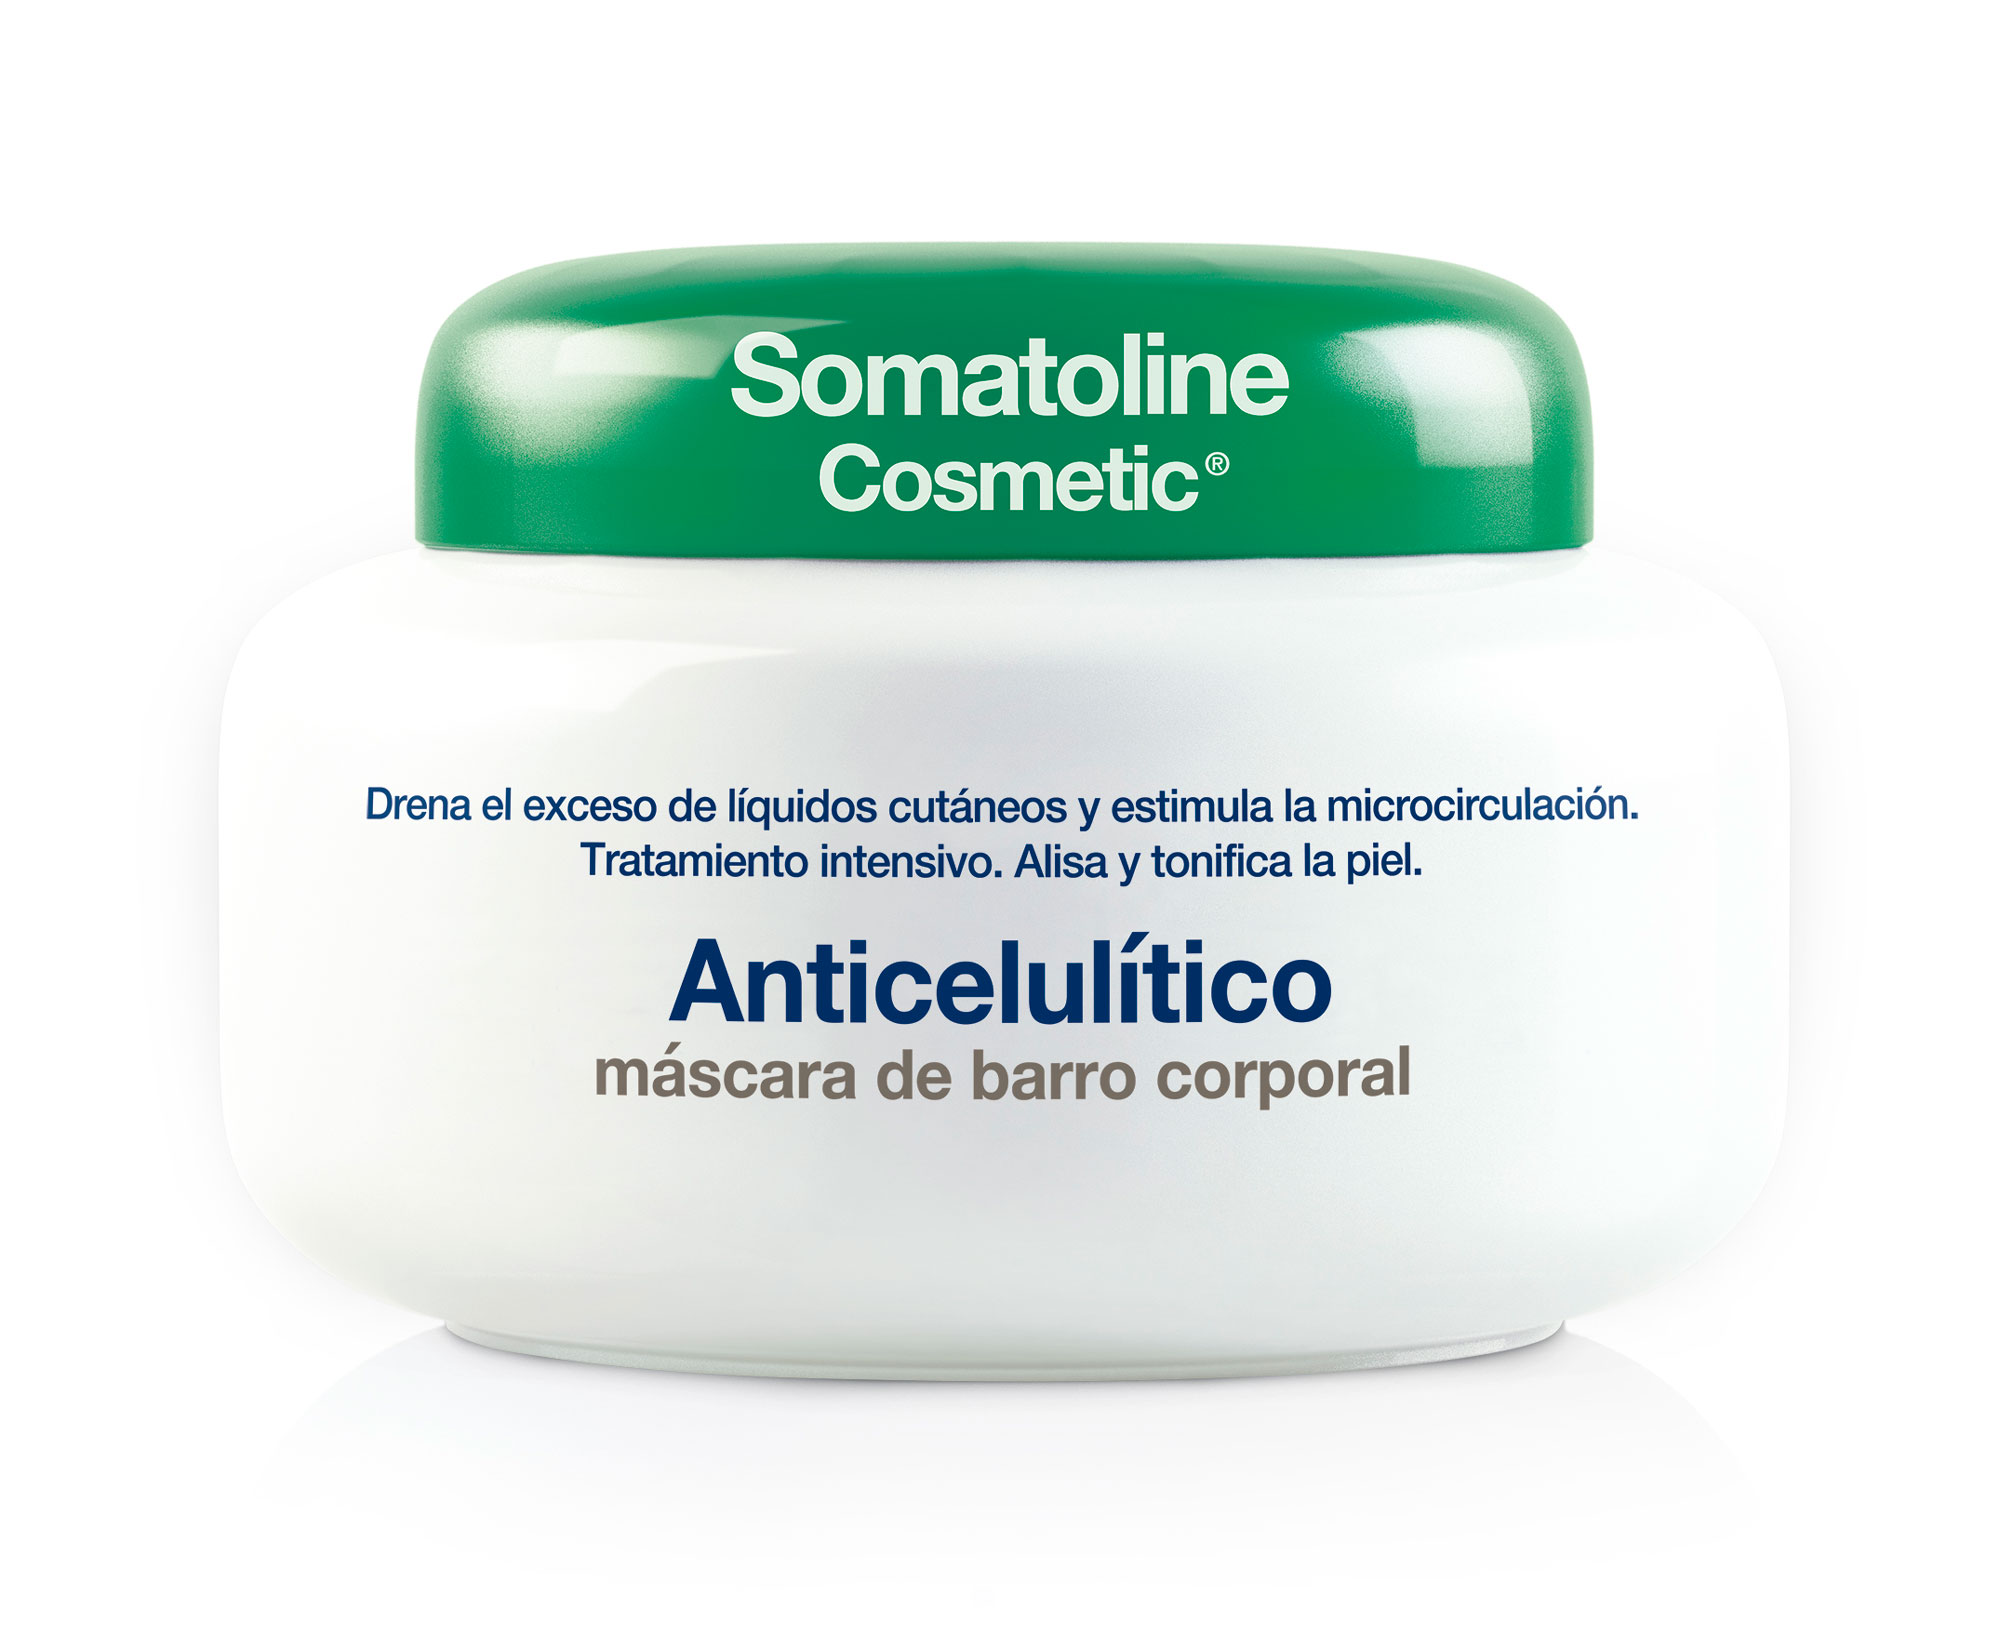 máscara corporal de barro Somatoline - Anticelulítico